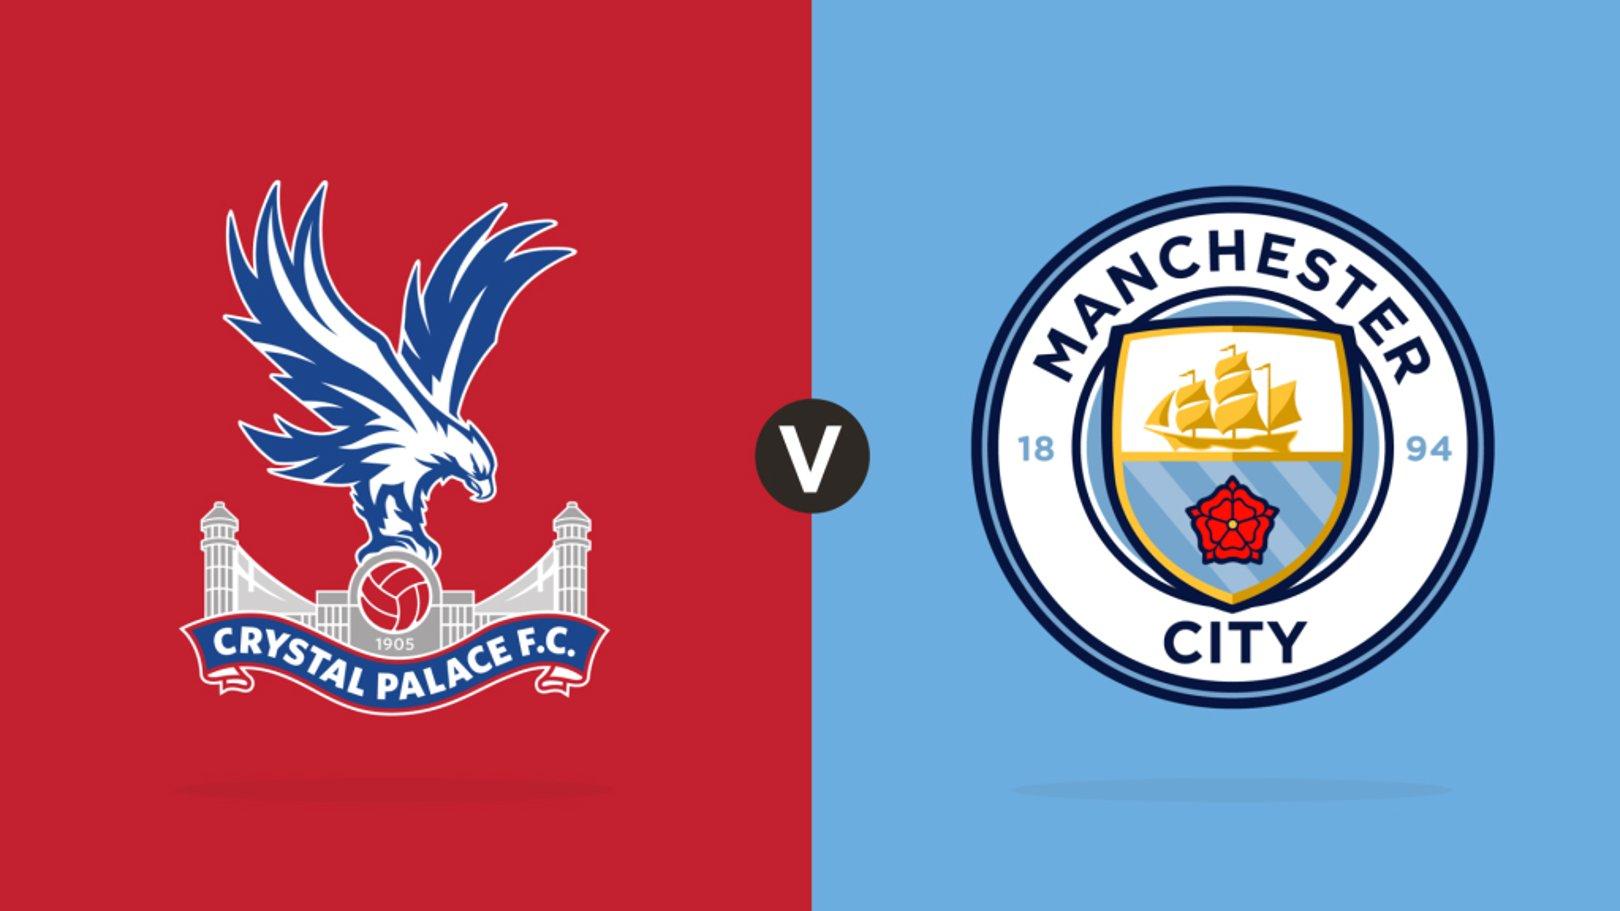 Crystal Palace v City